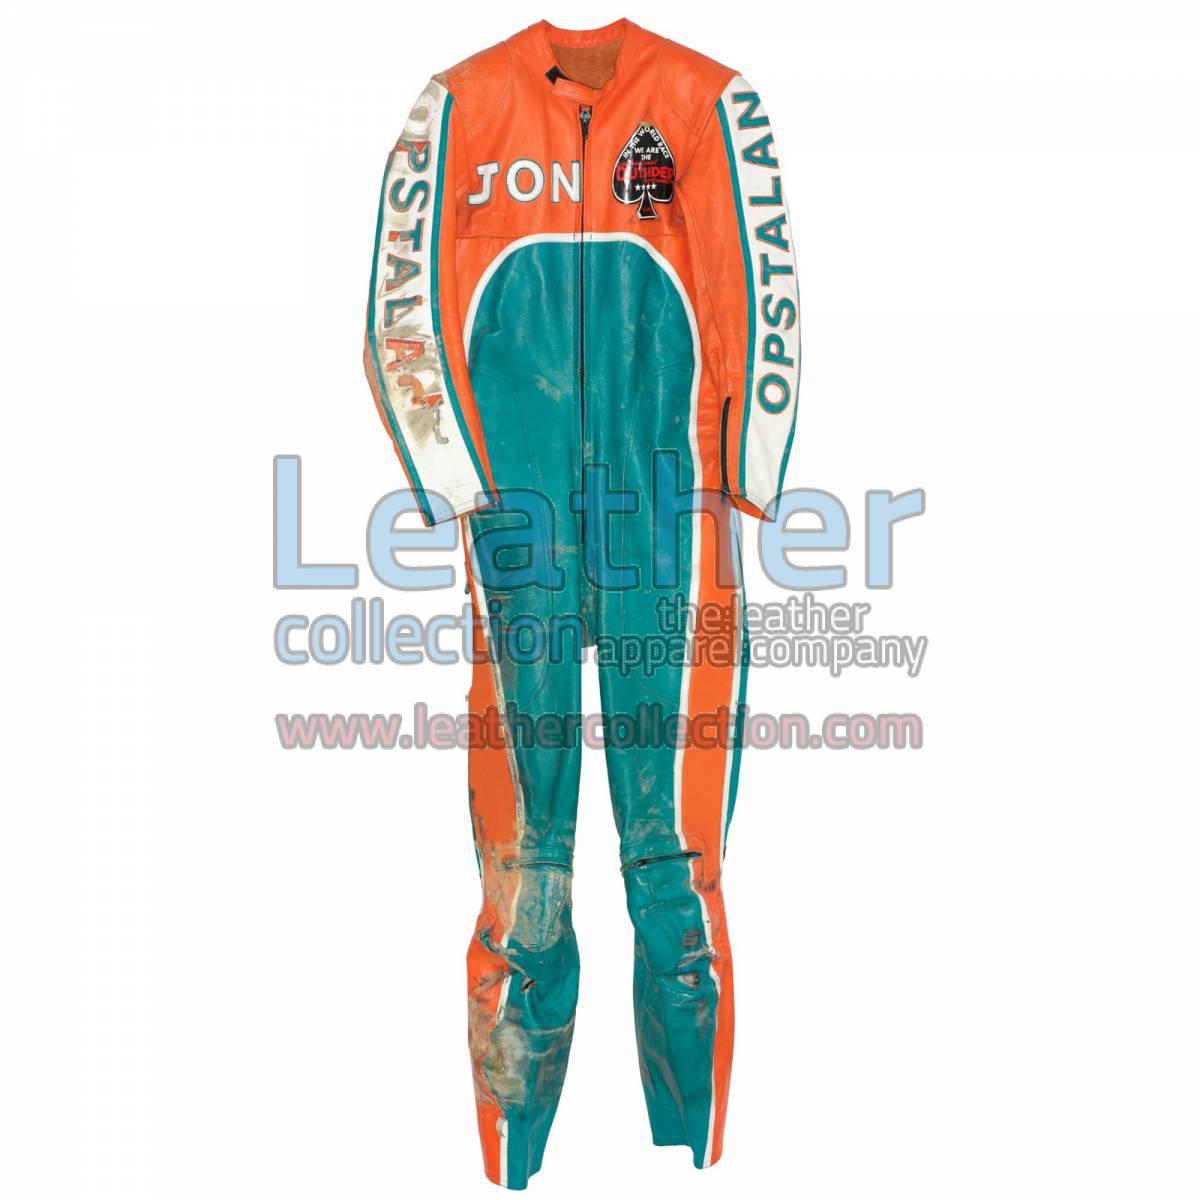 Jon Ekerold Yamaha GP 1980 Leathers